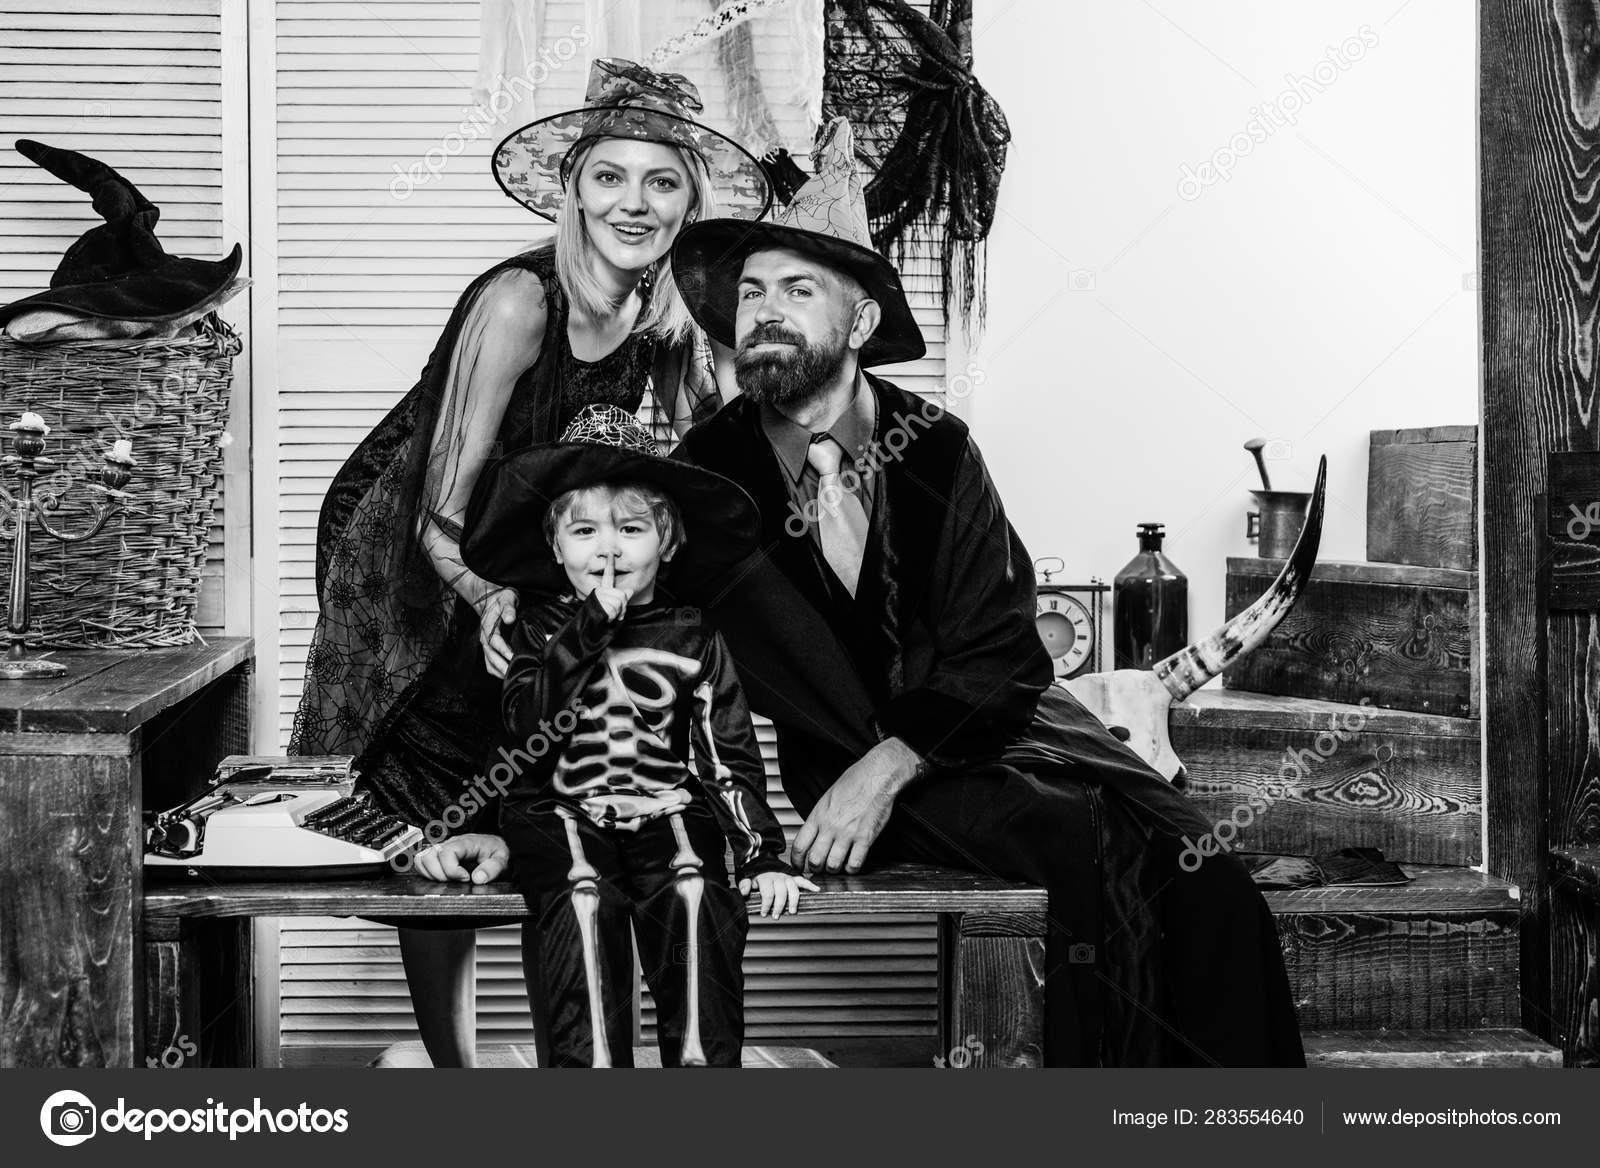 Halloween Family Photos  Skeleton posing with parents